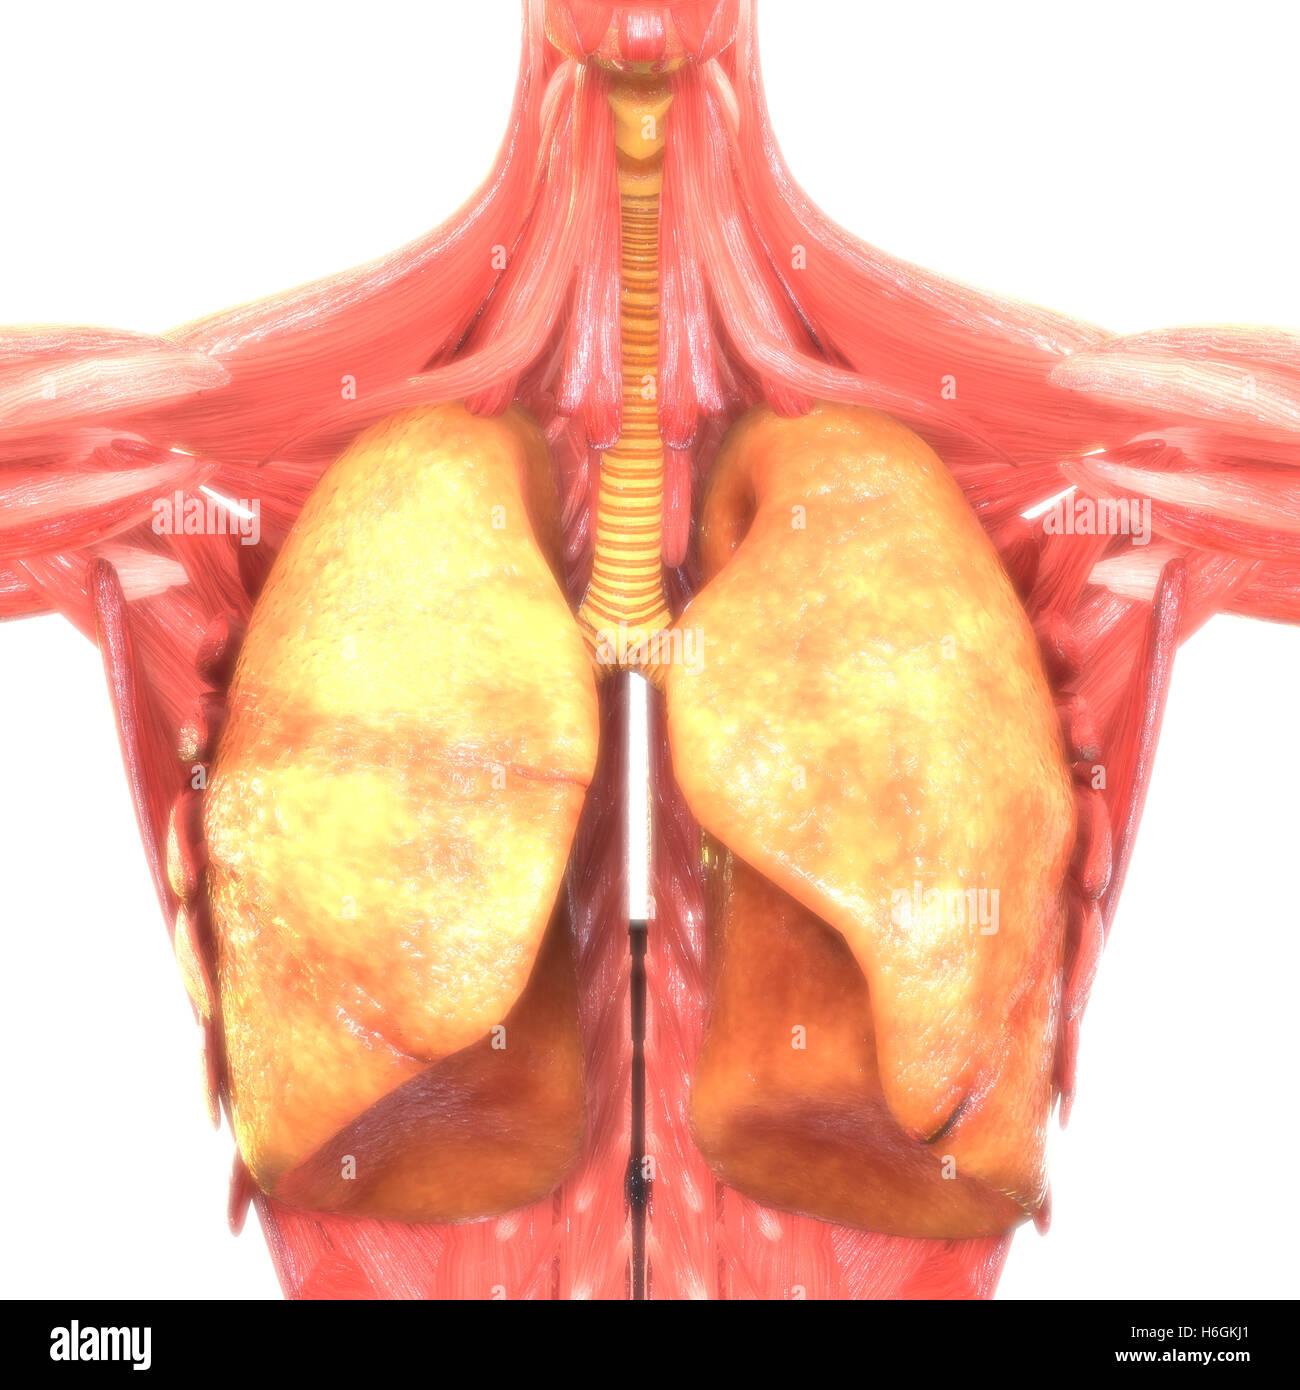 Human Respiratory System Lungs Anatomy Stock Photo 124527145 Alamy